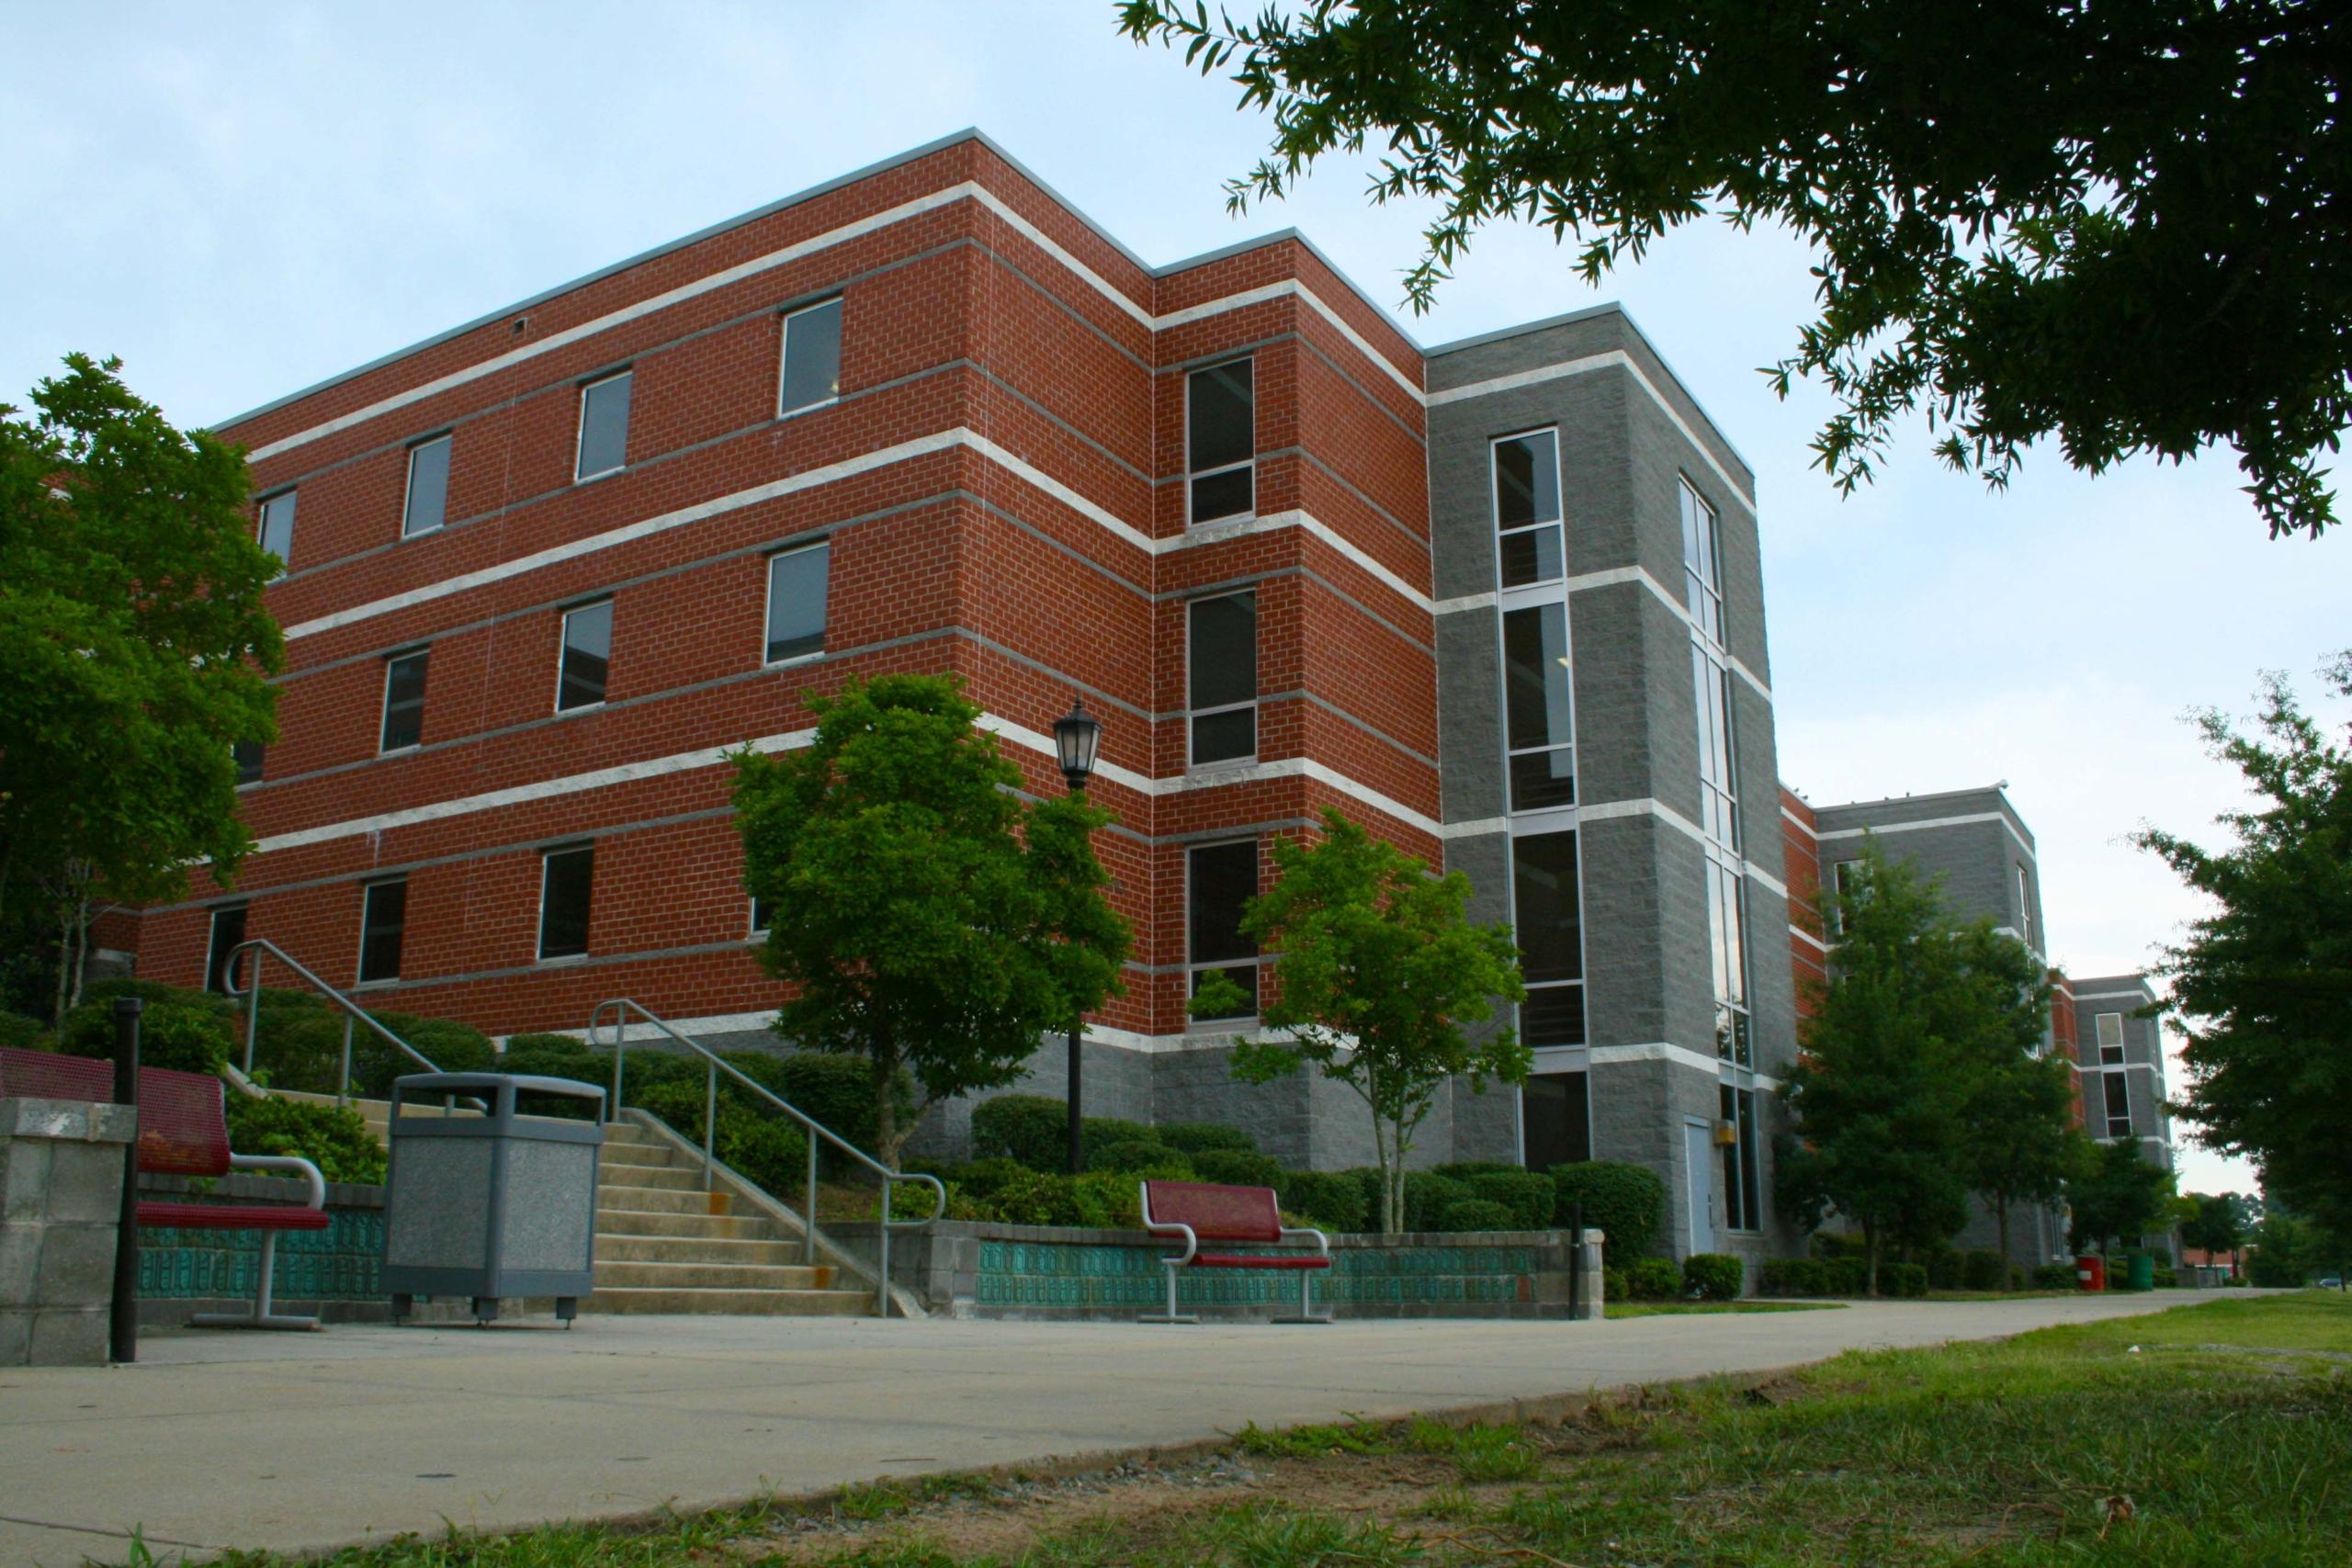 2008-07-25_NCCU_New_Residence_Halls-scaled.jpg?time=1593902809